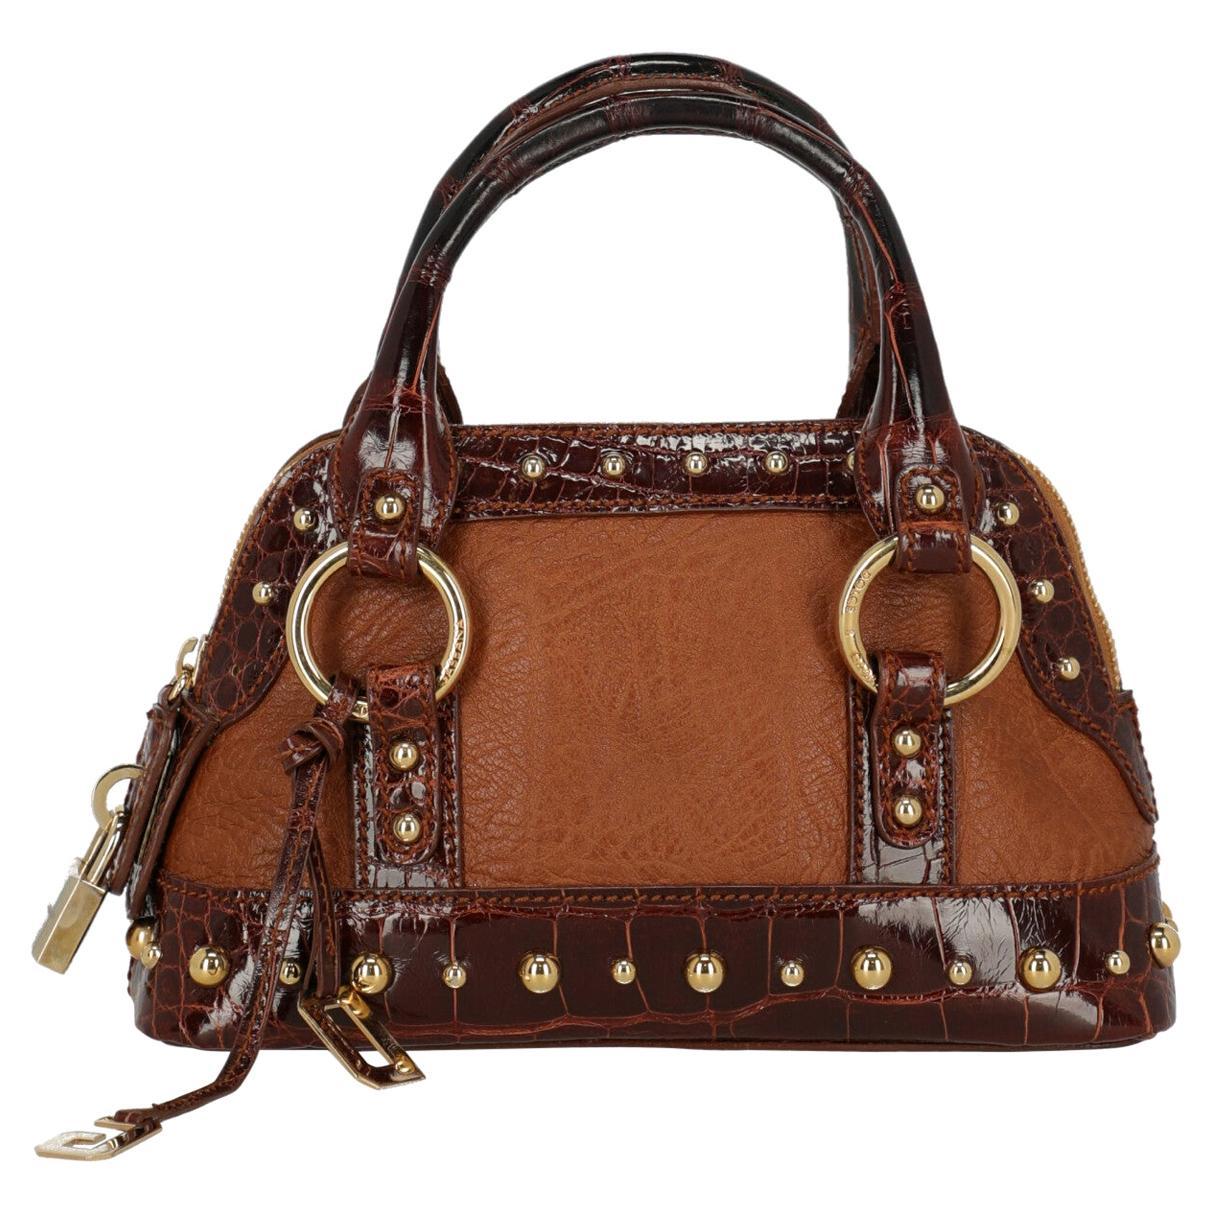 Dolce & Gabbana Woman Handbag Brown Leather